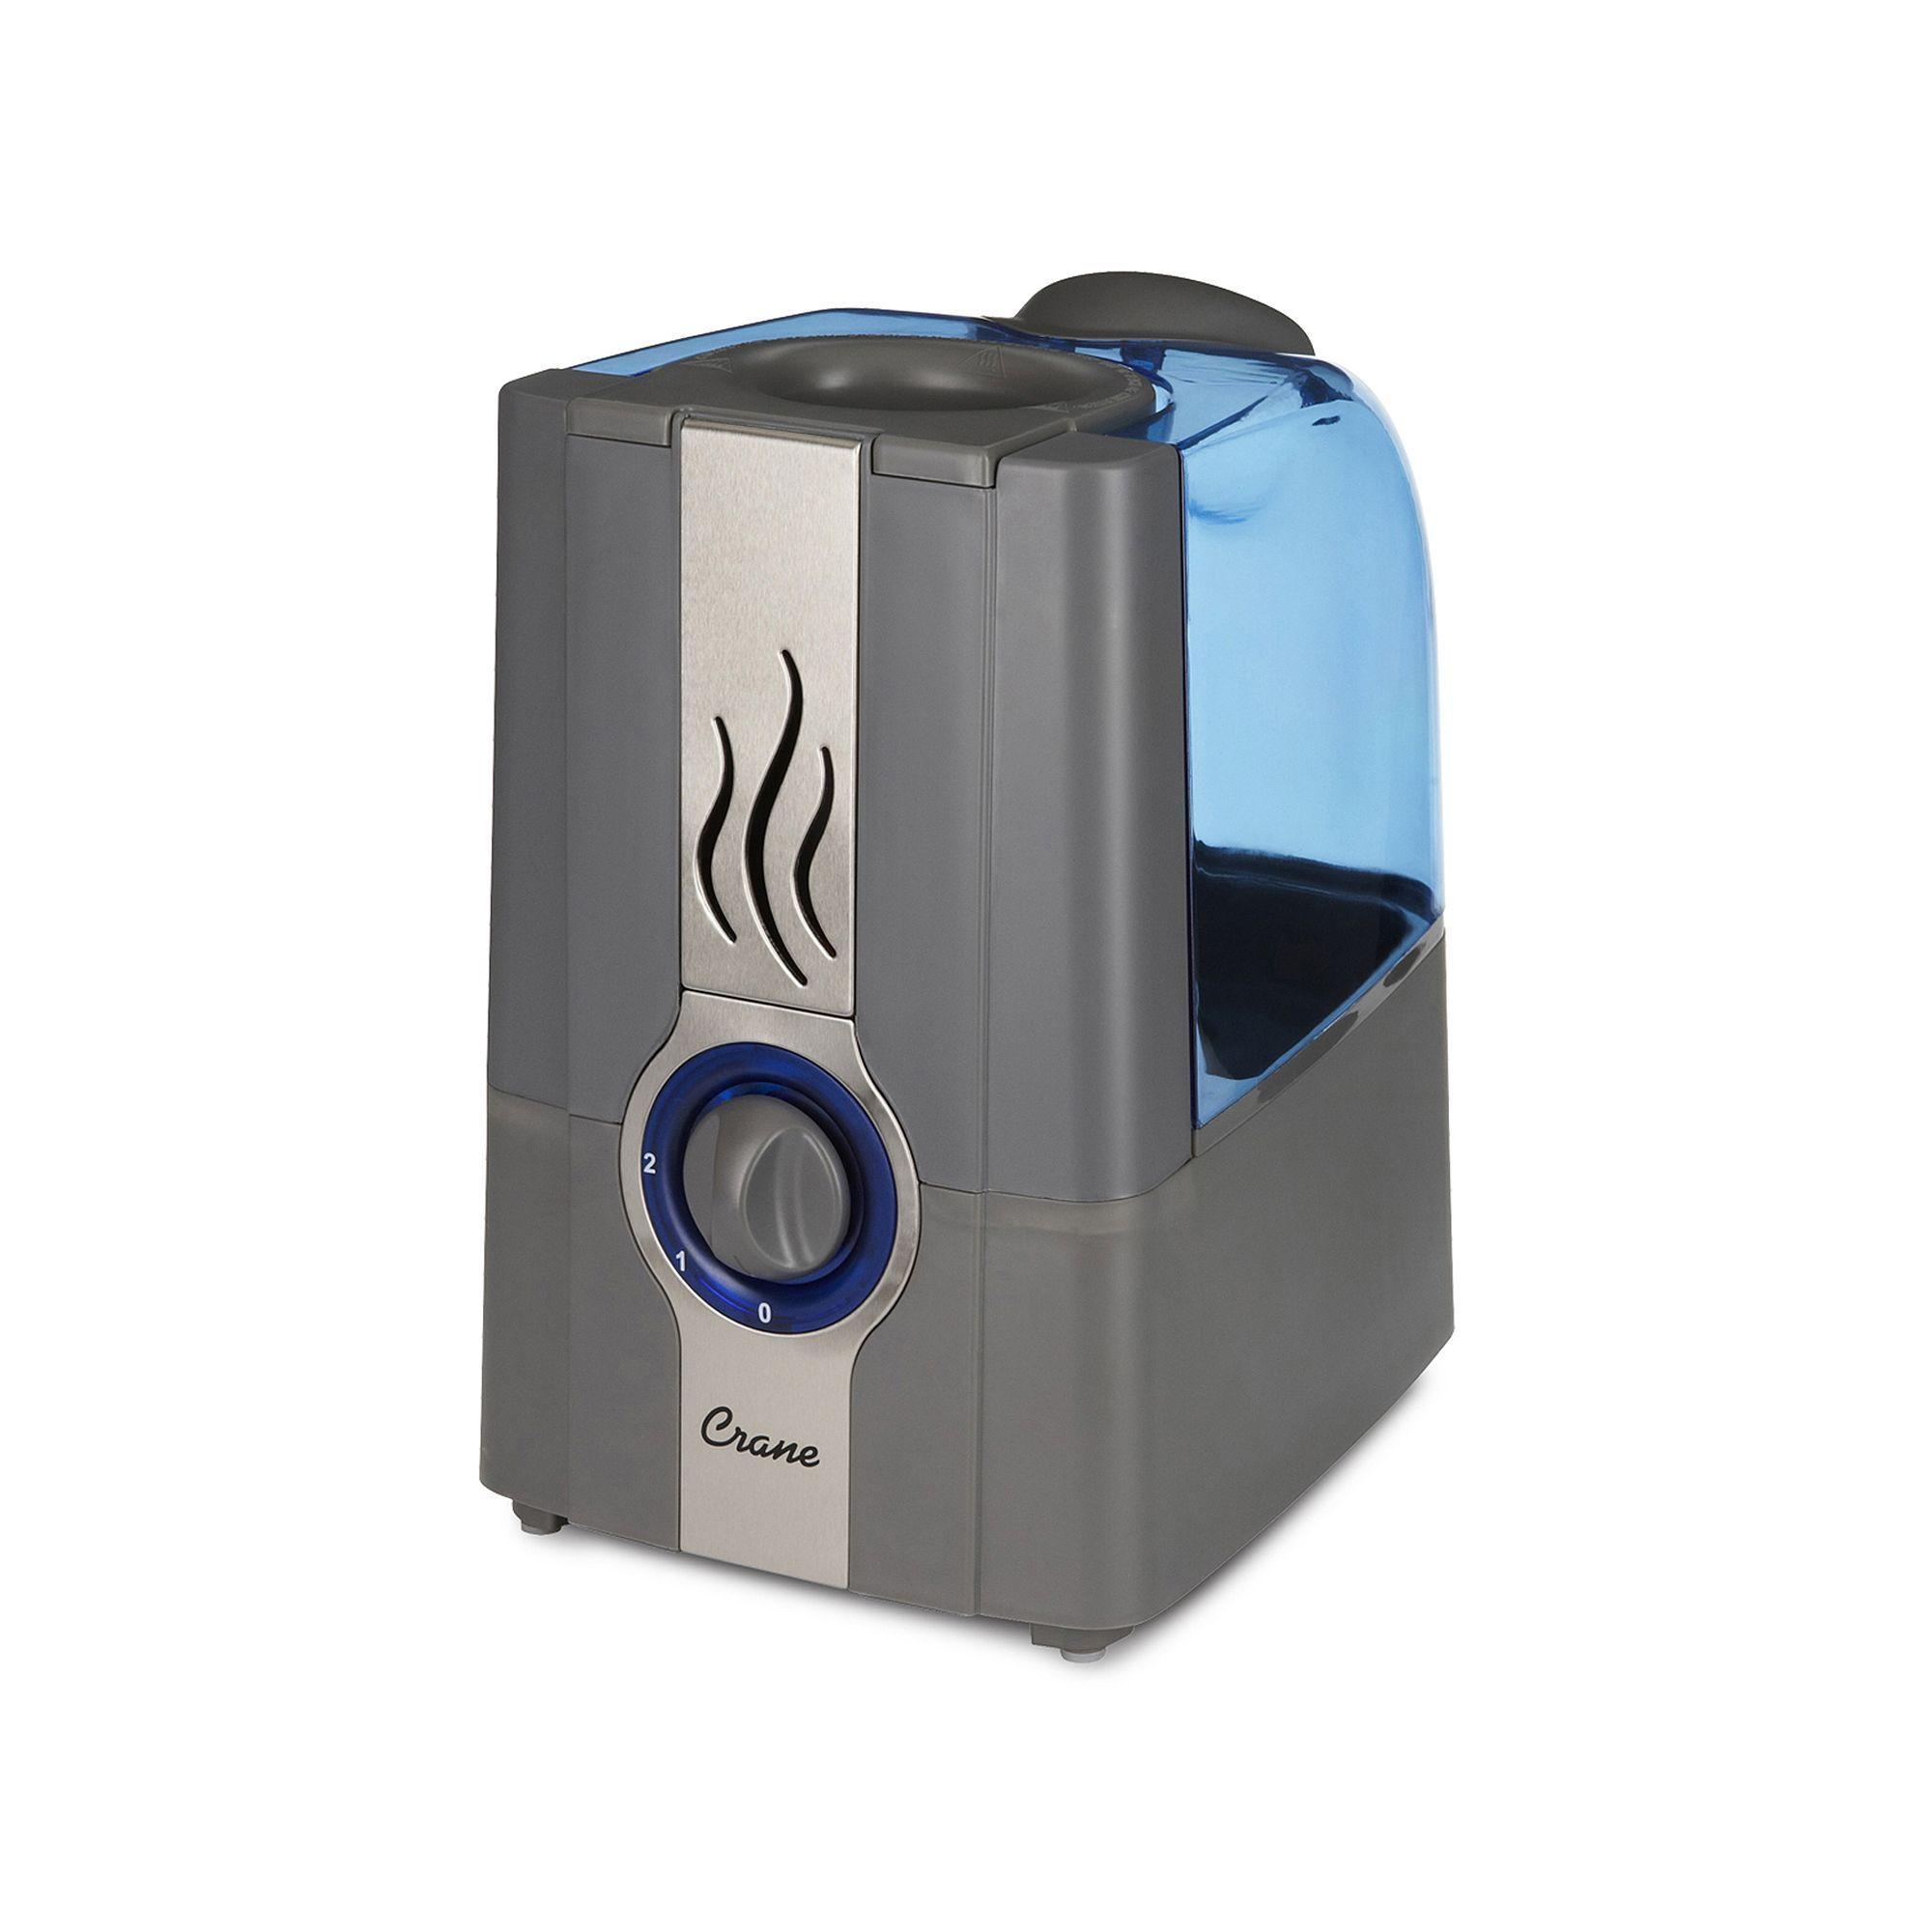 Crane Warm Mist Humidifier | Warm mist humidifier